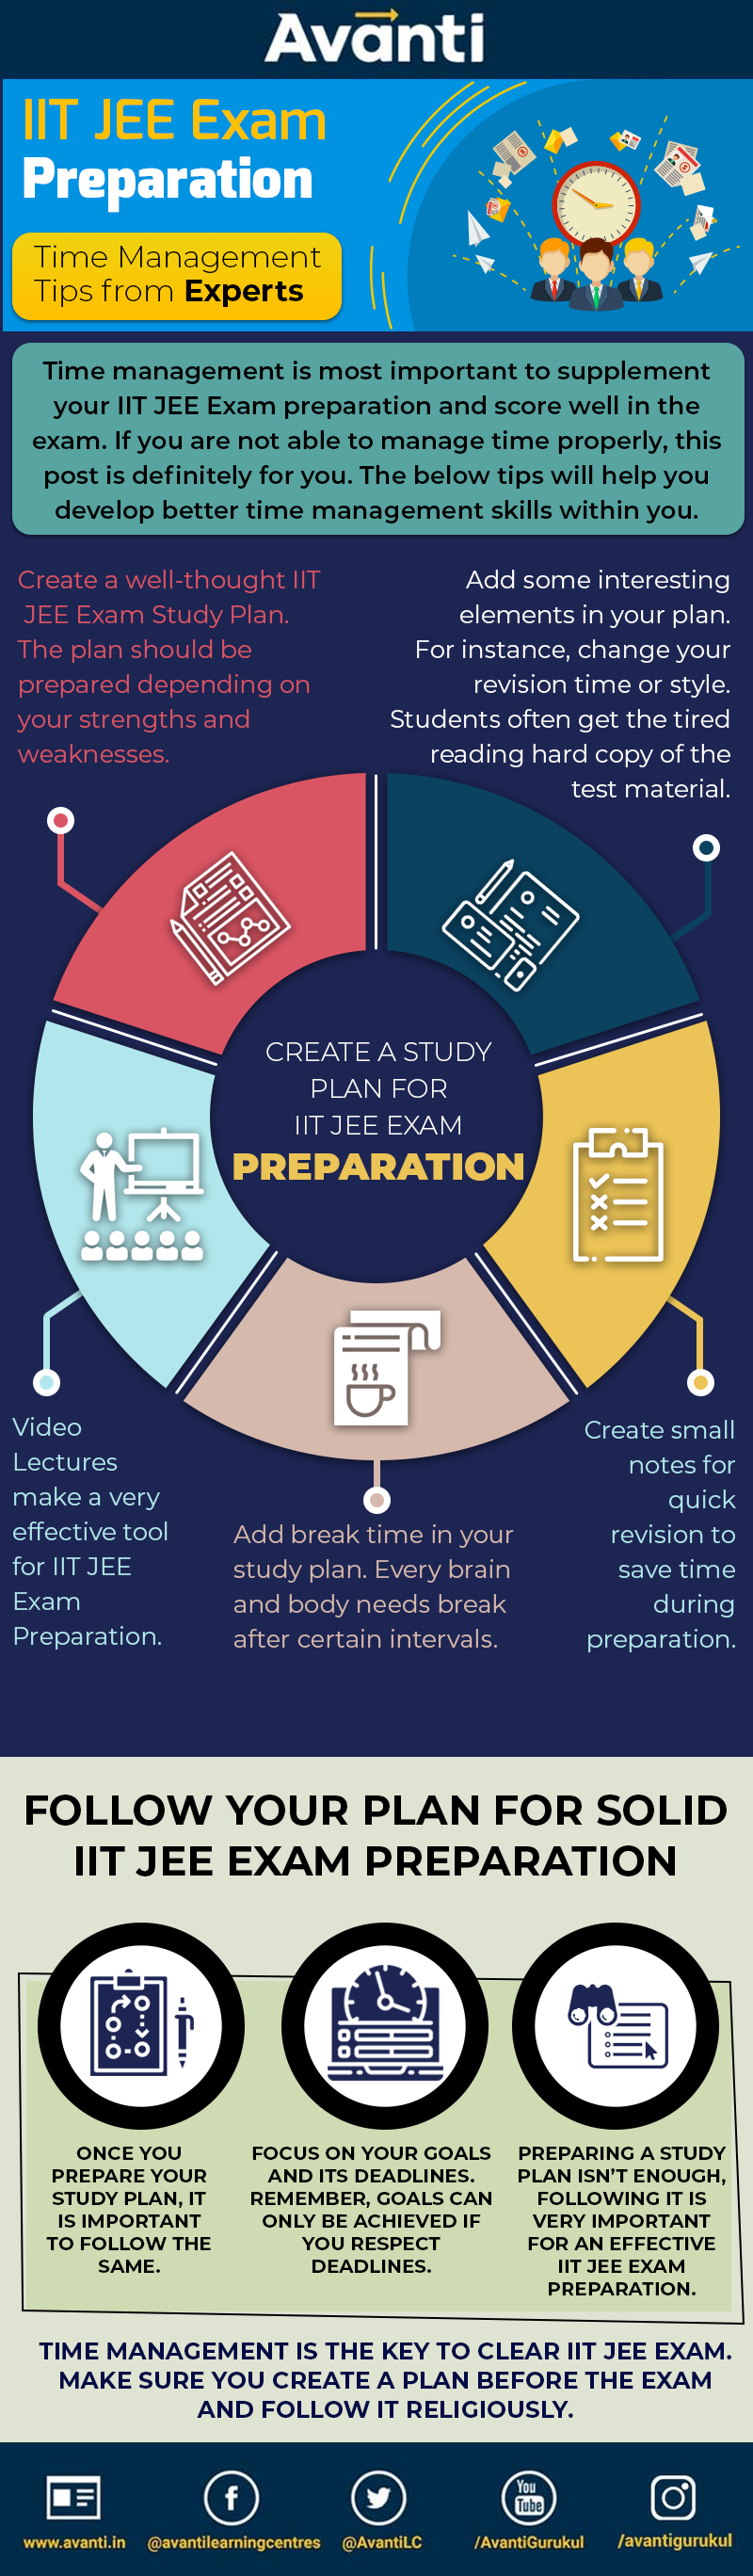 IIT JEE Exam Preparation